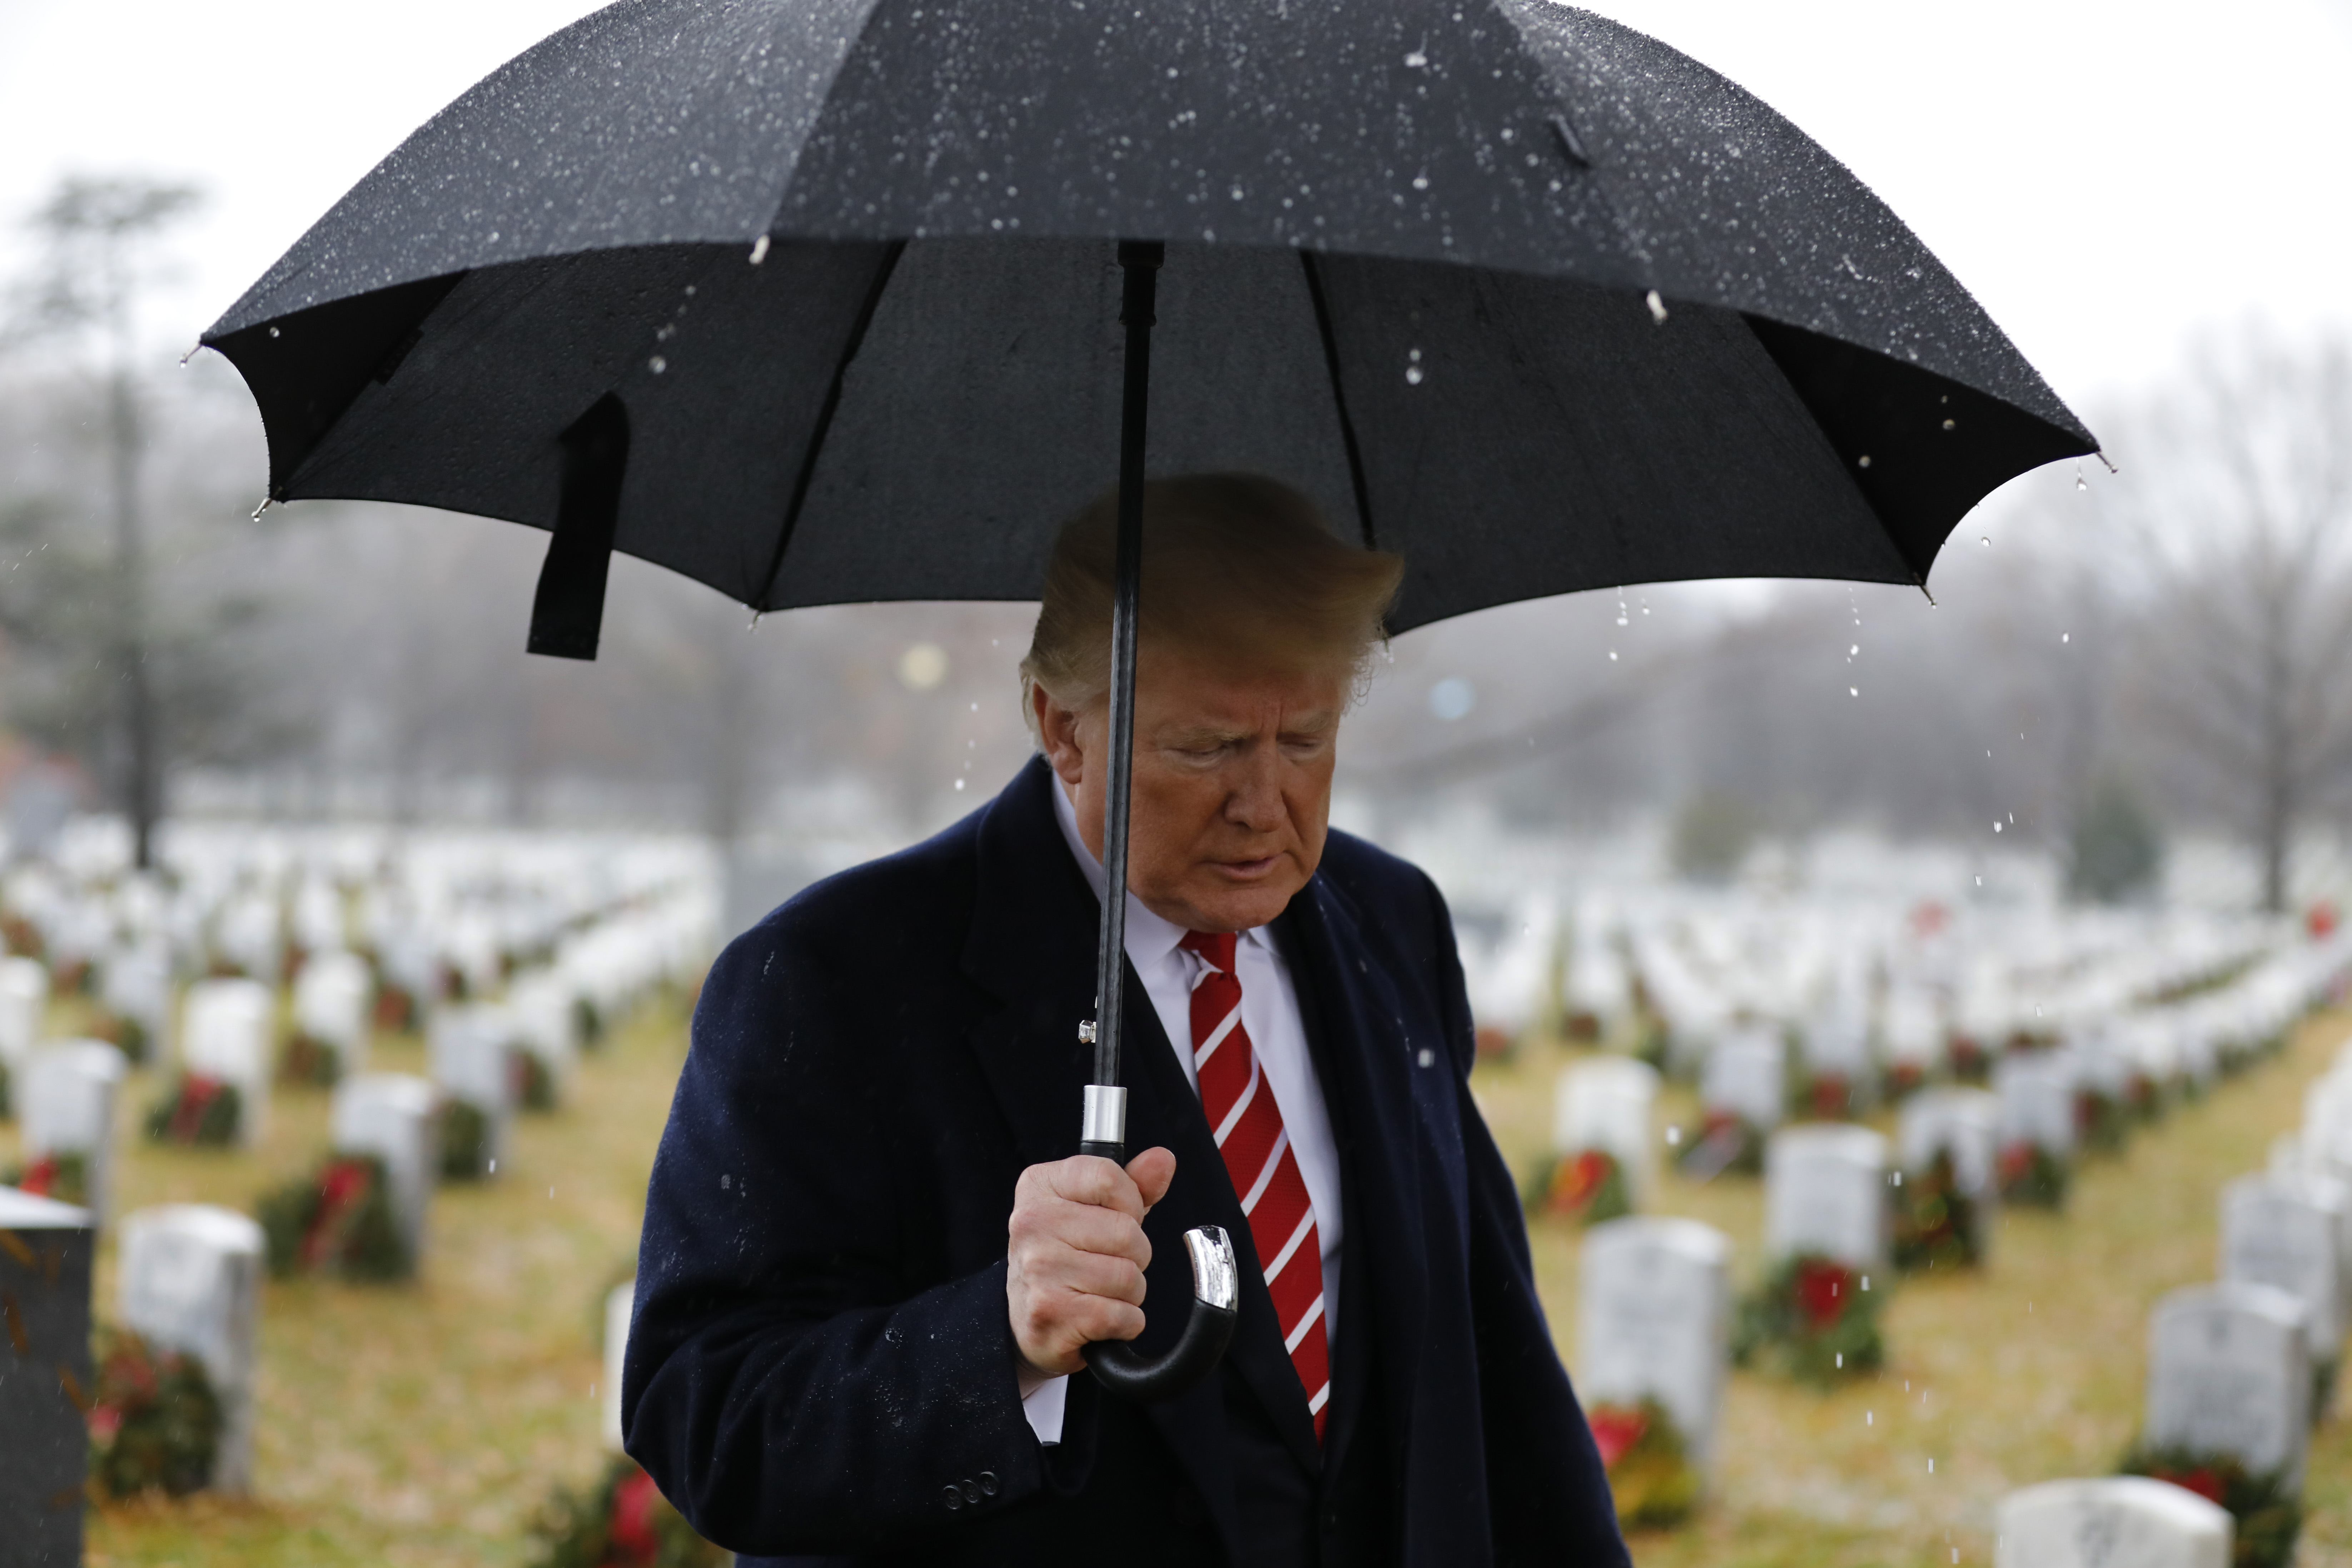 President Donald Trump visits Section 60 at Arlington National Cemetery on December 15, 2018 in Arlington, Virginia.